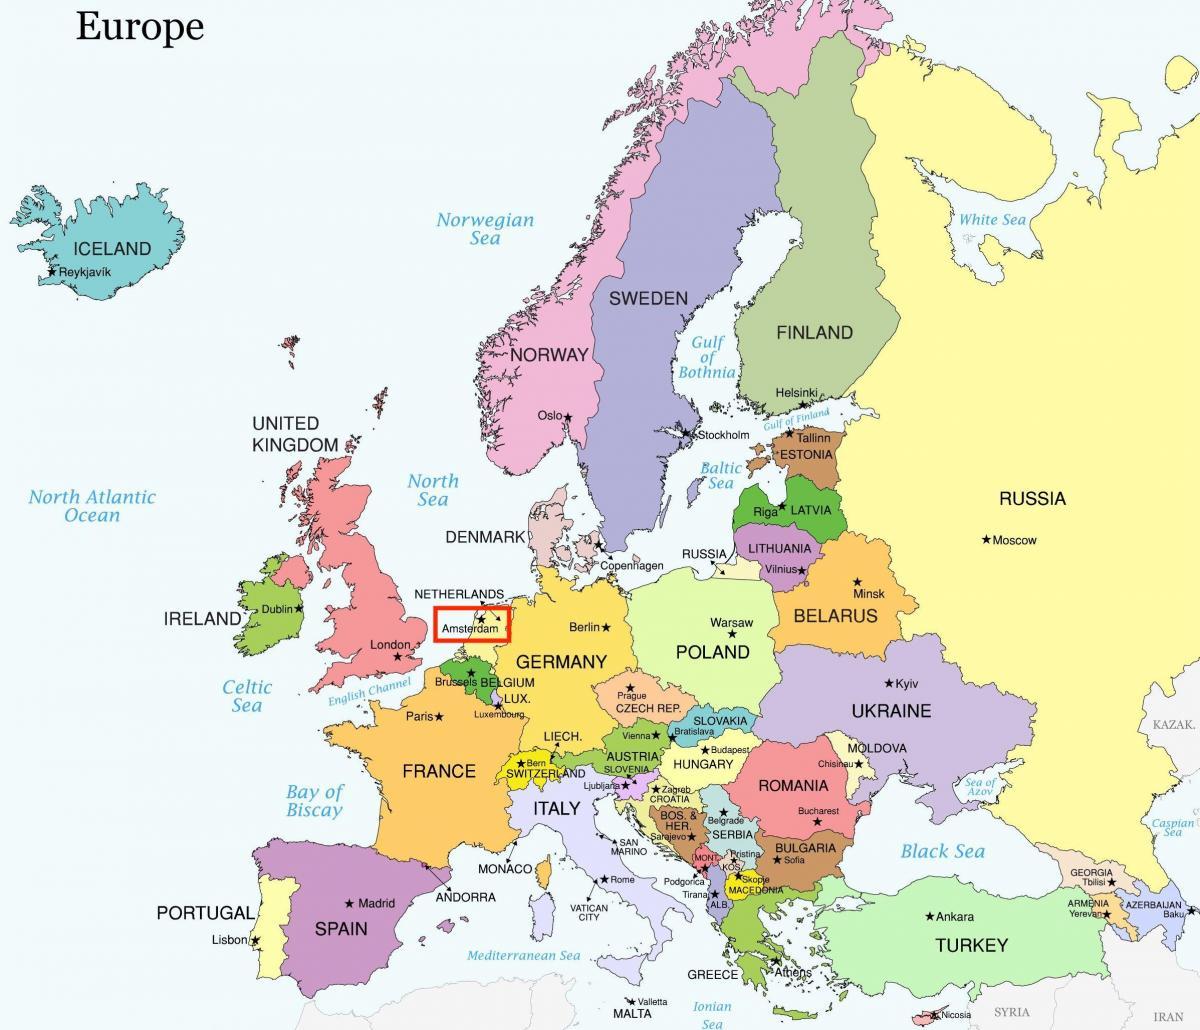 Carte Europe Pays Bas.Carte D Amsterdam Europe Amsterdam Sur La Carte De L Europe Pays Bas